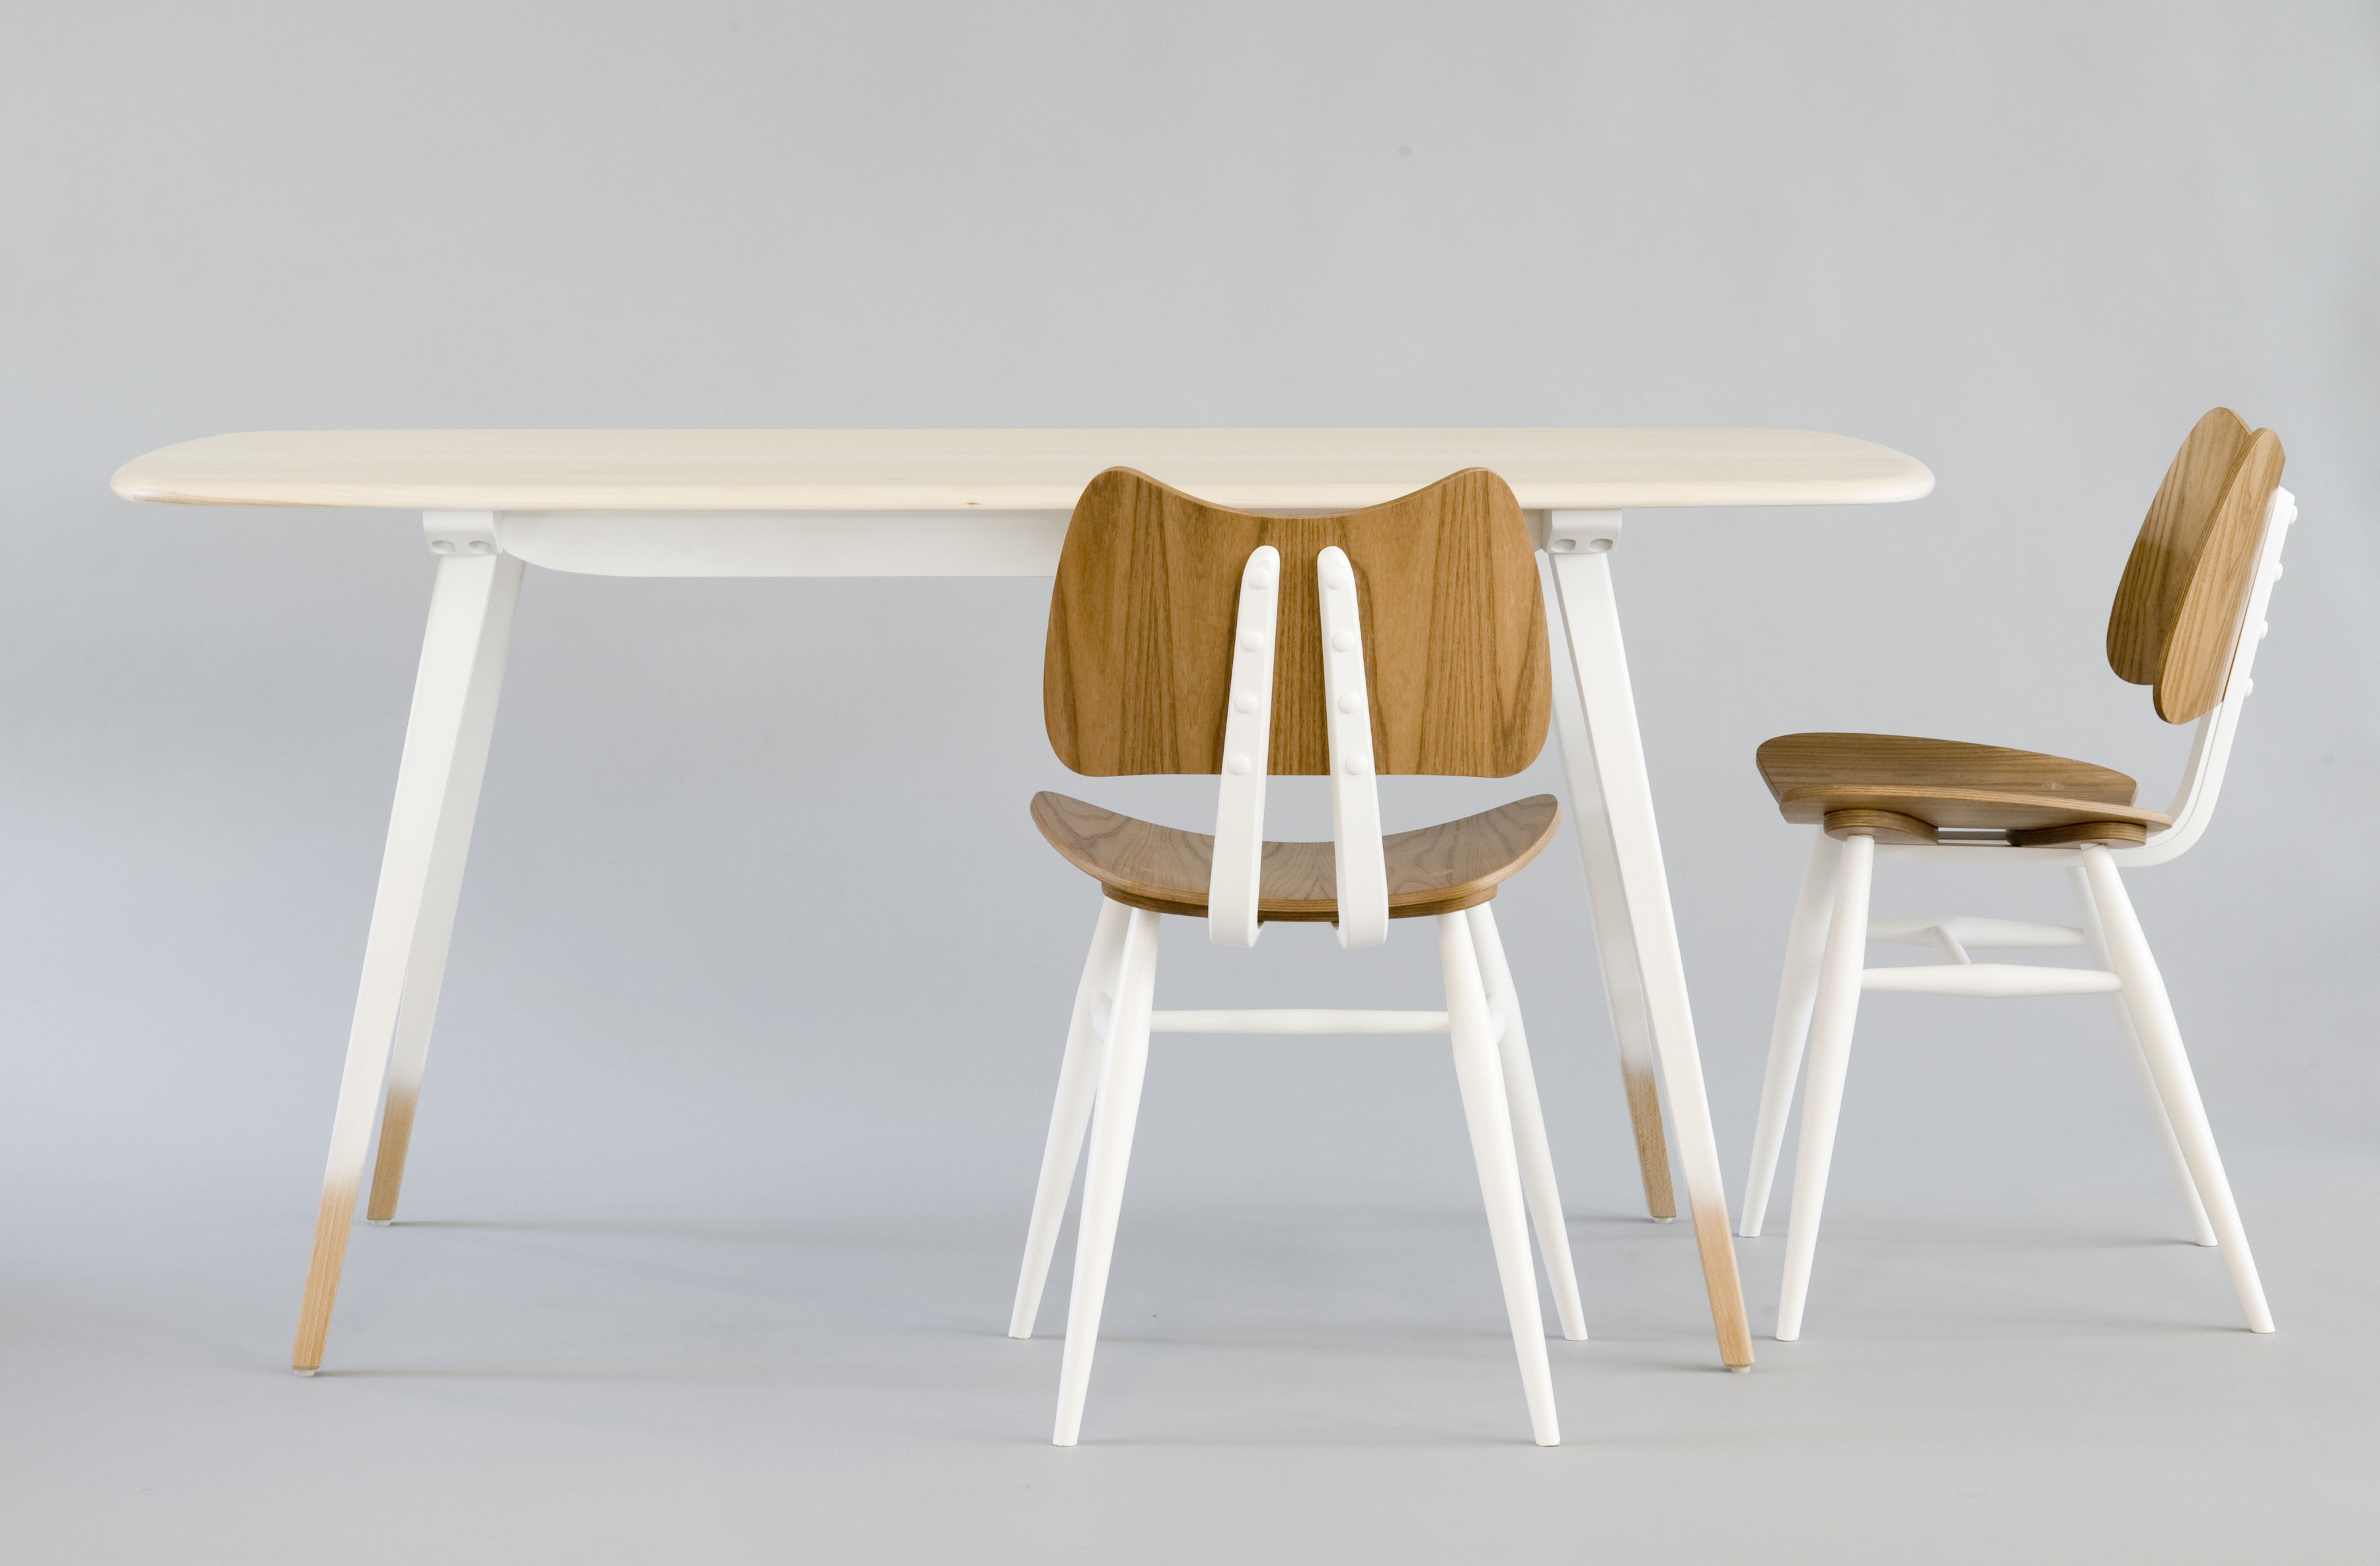 chaise butterfly bois r dition 1958 blanc bois naturel ercol. Black Bedroom Furniture Sets. Home Design Ideas